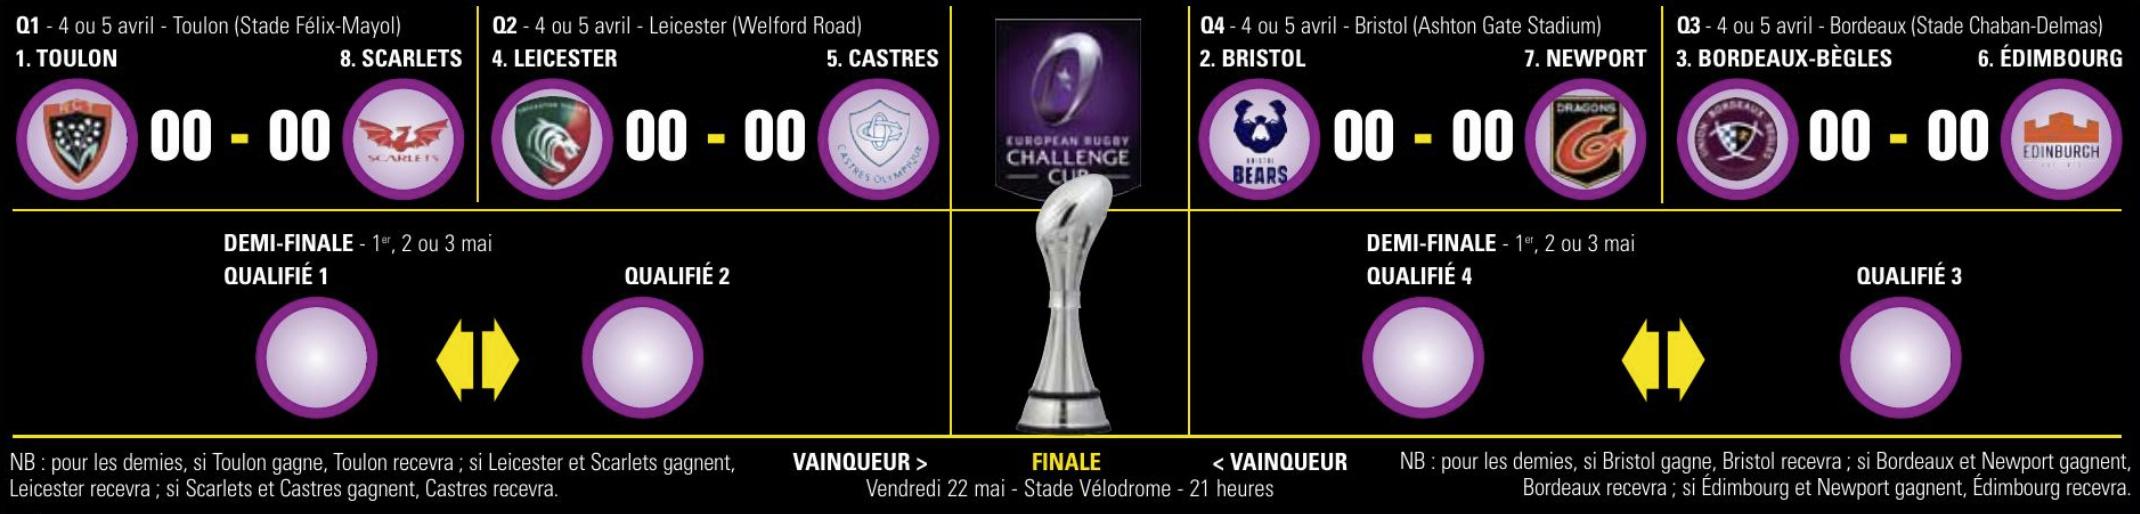 Coupe d'Europe 2019-2020 - Page 31 Captu362